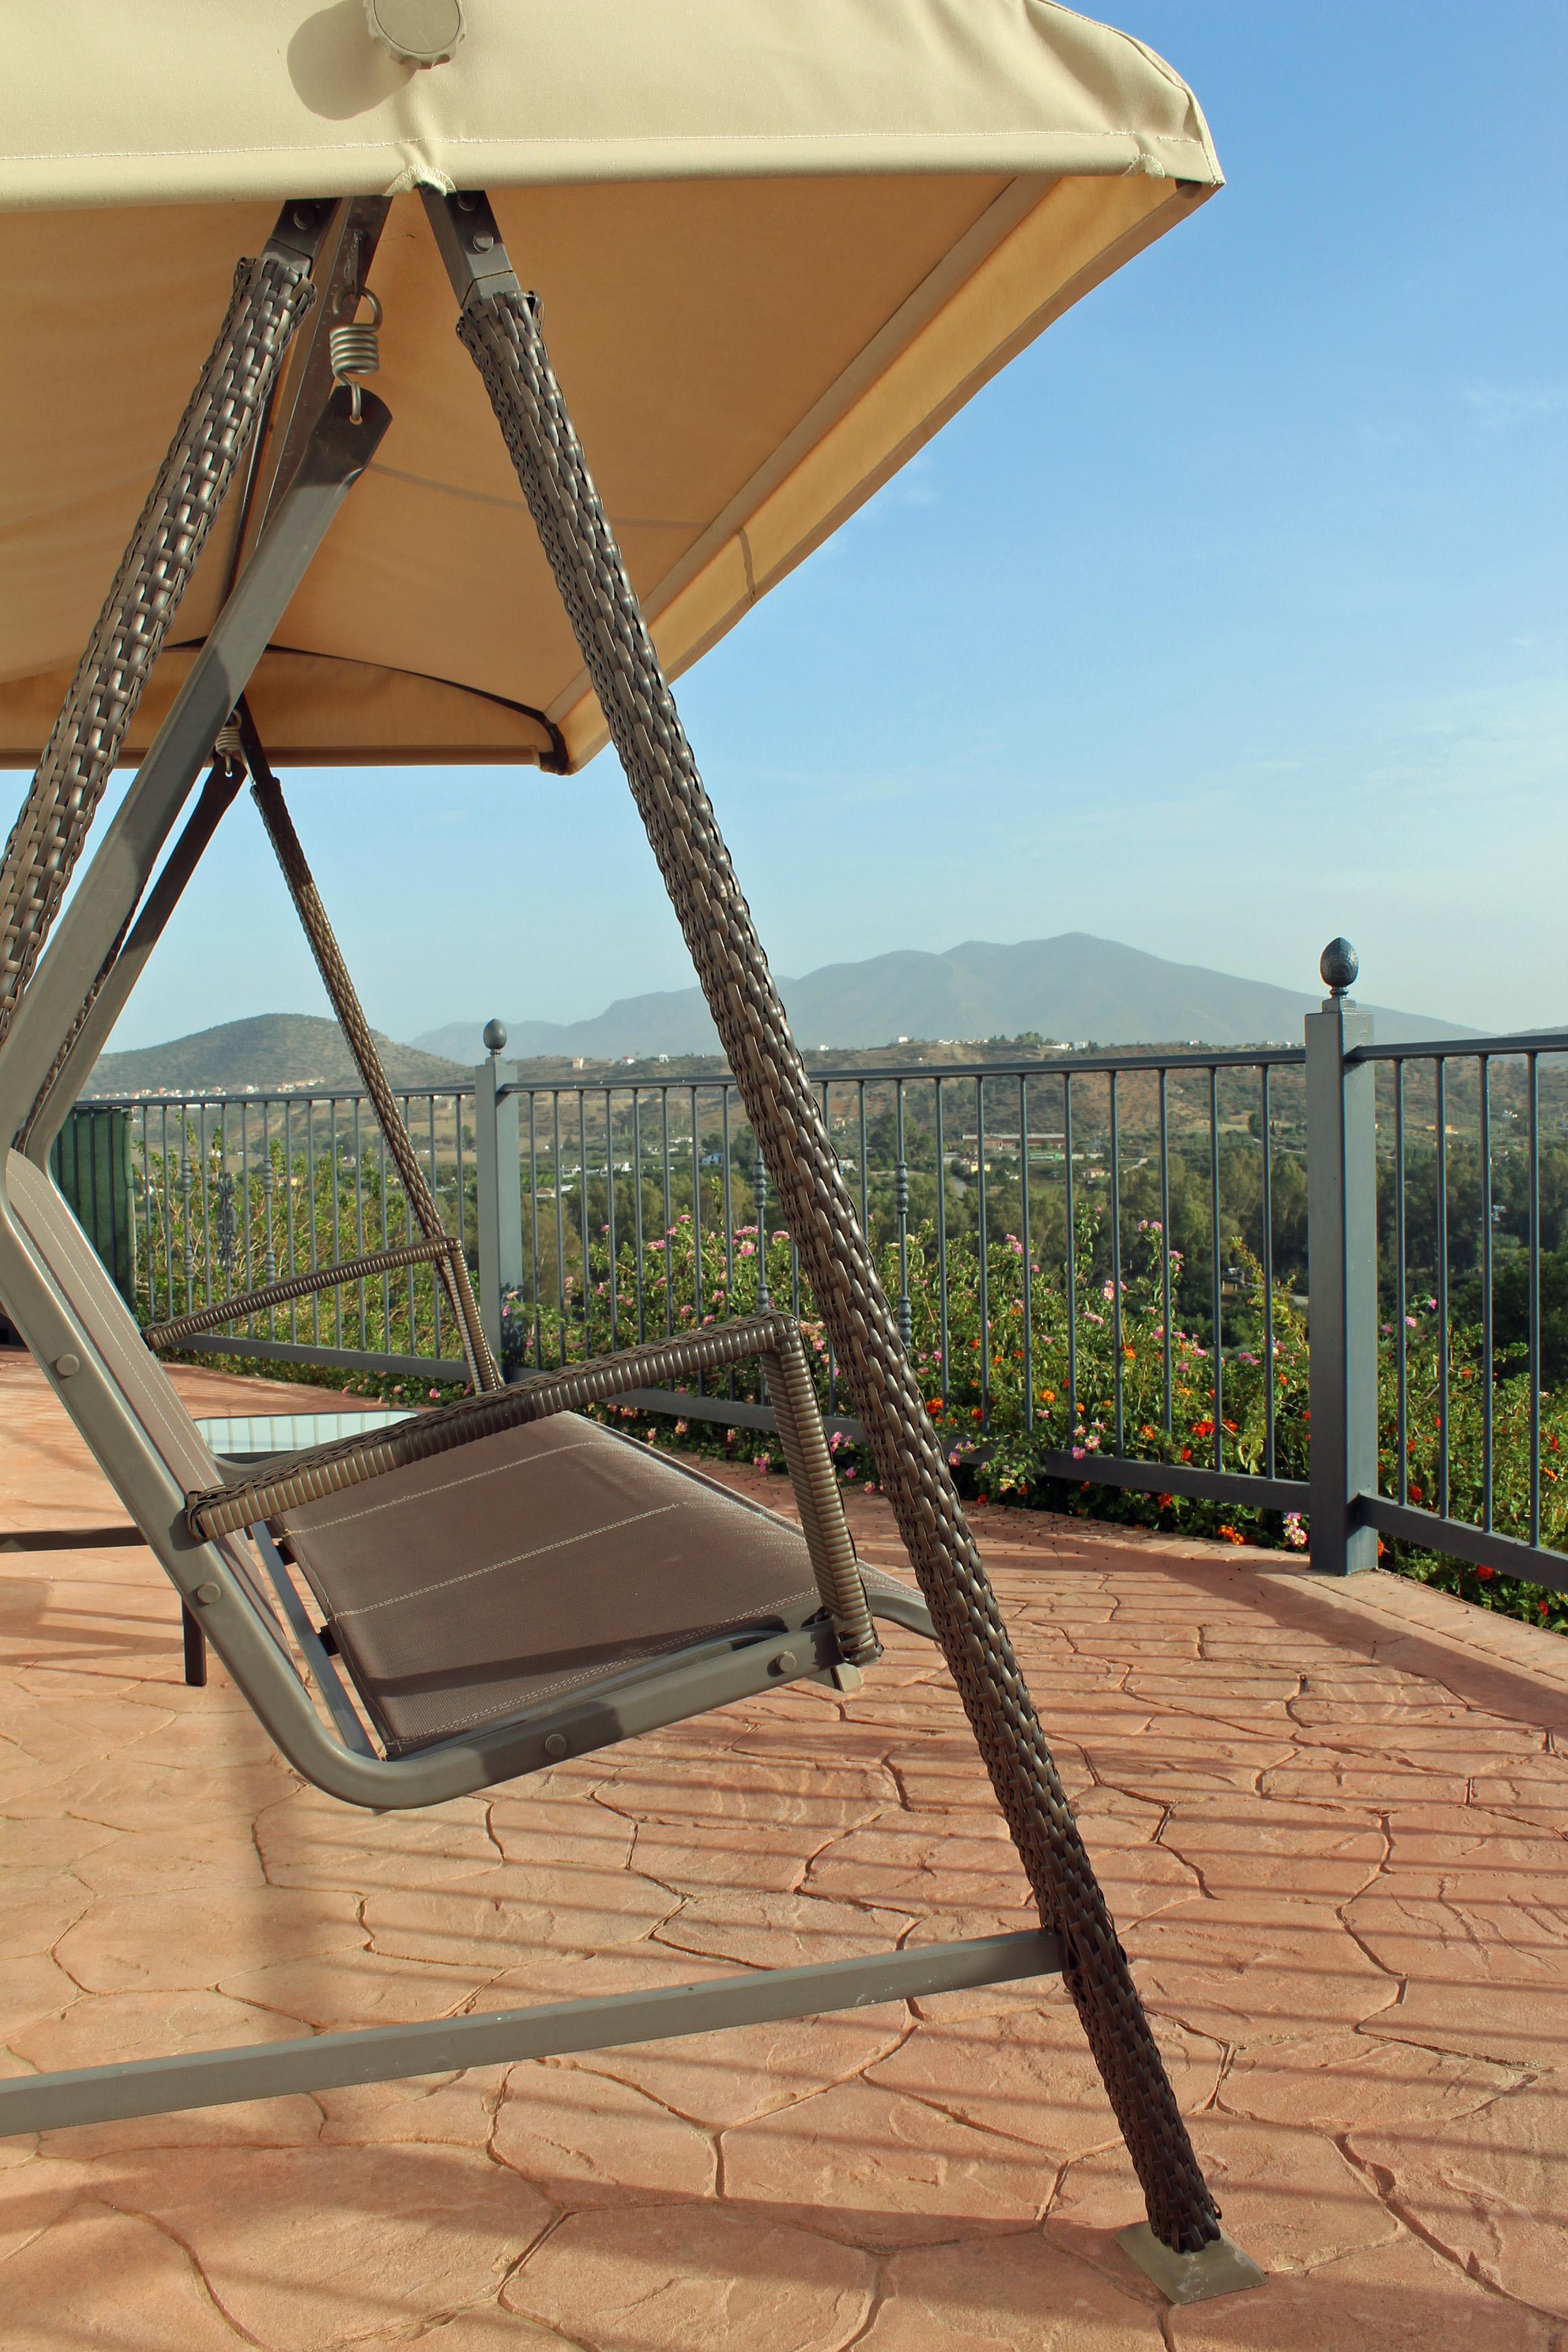 A7 Swing Seat